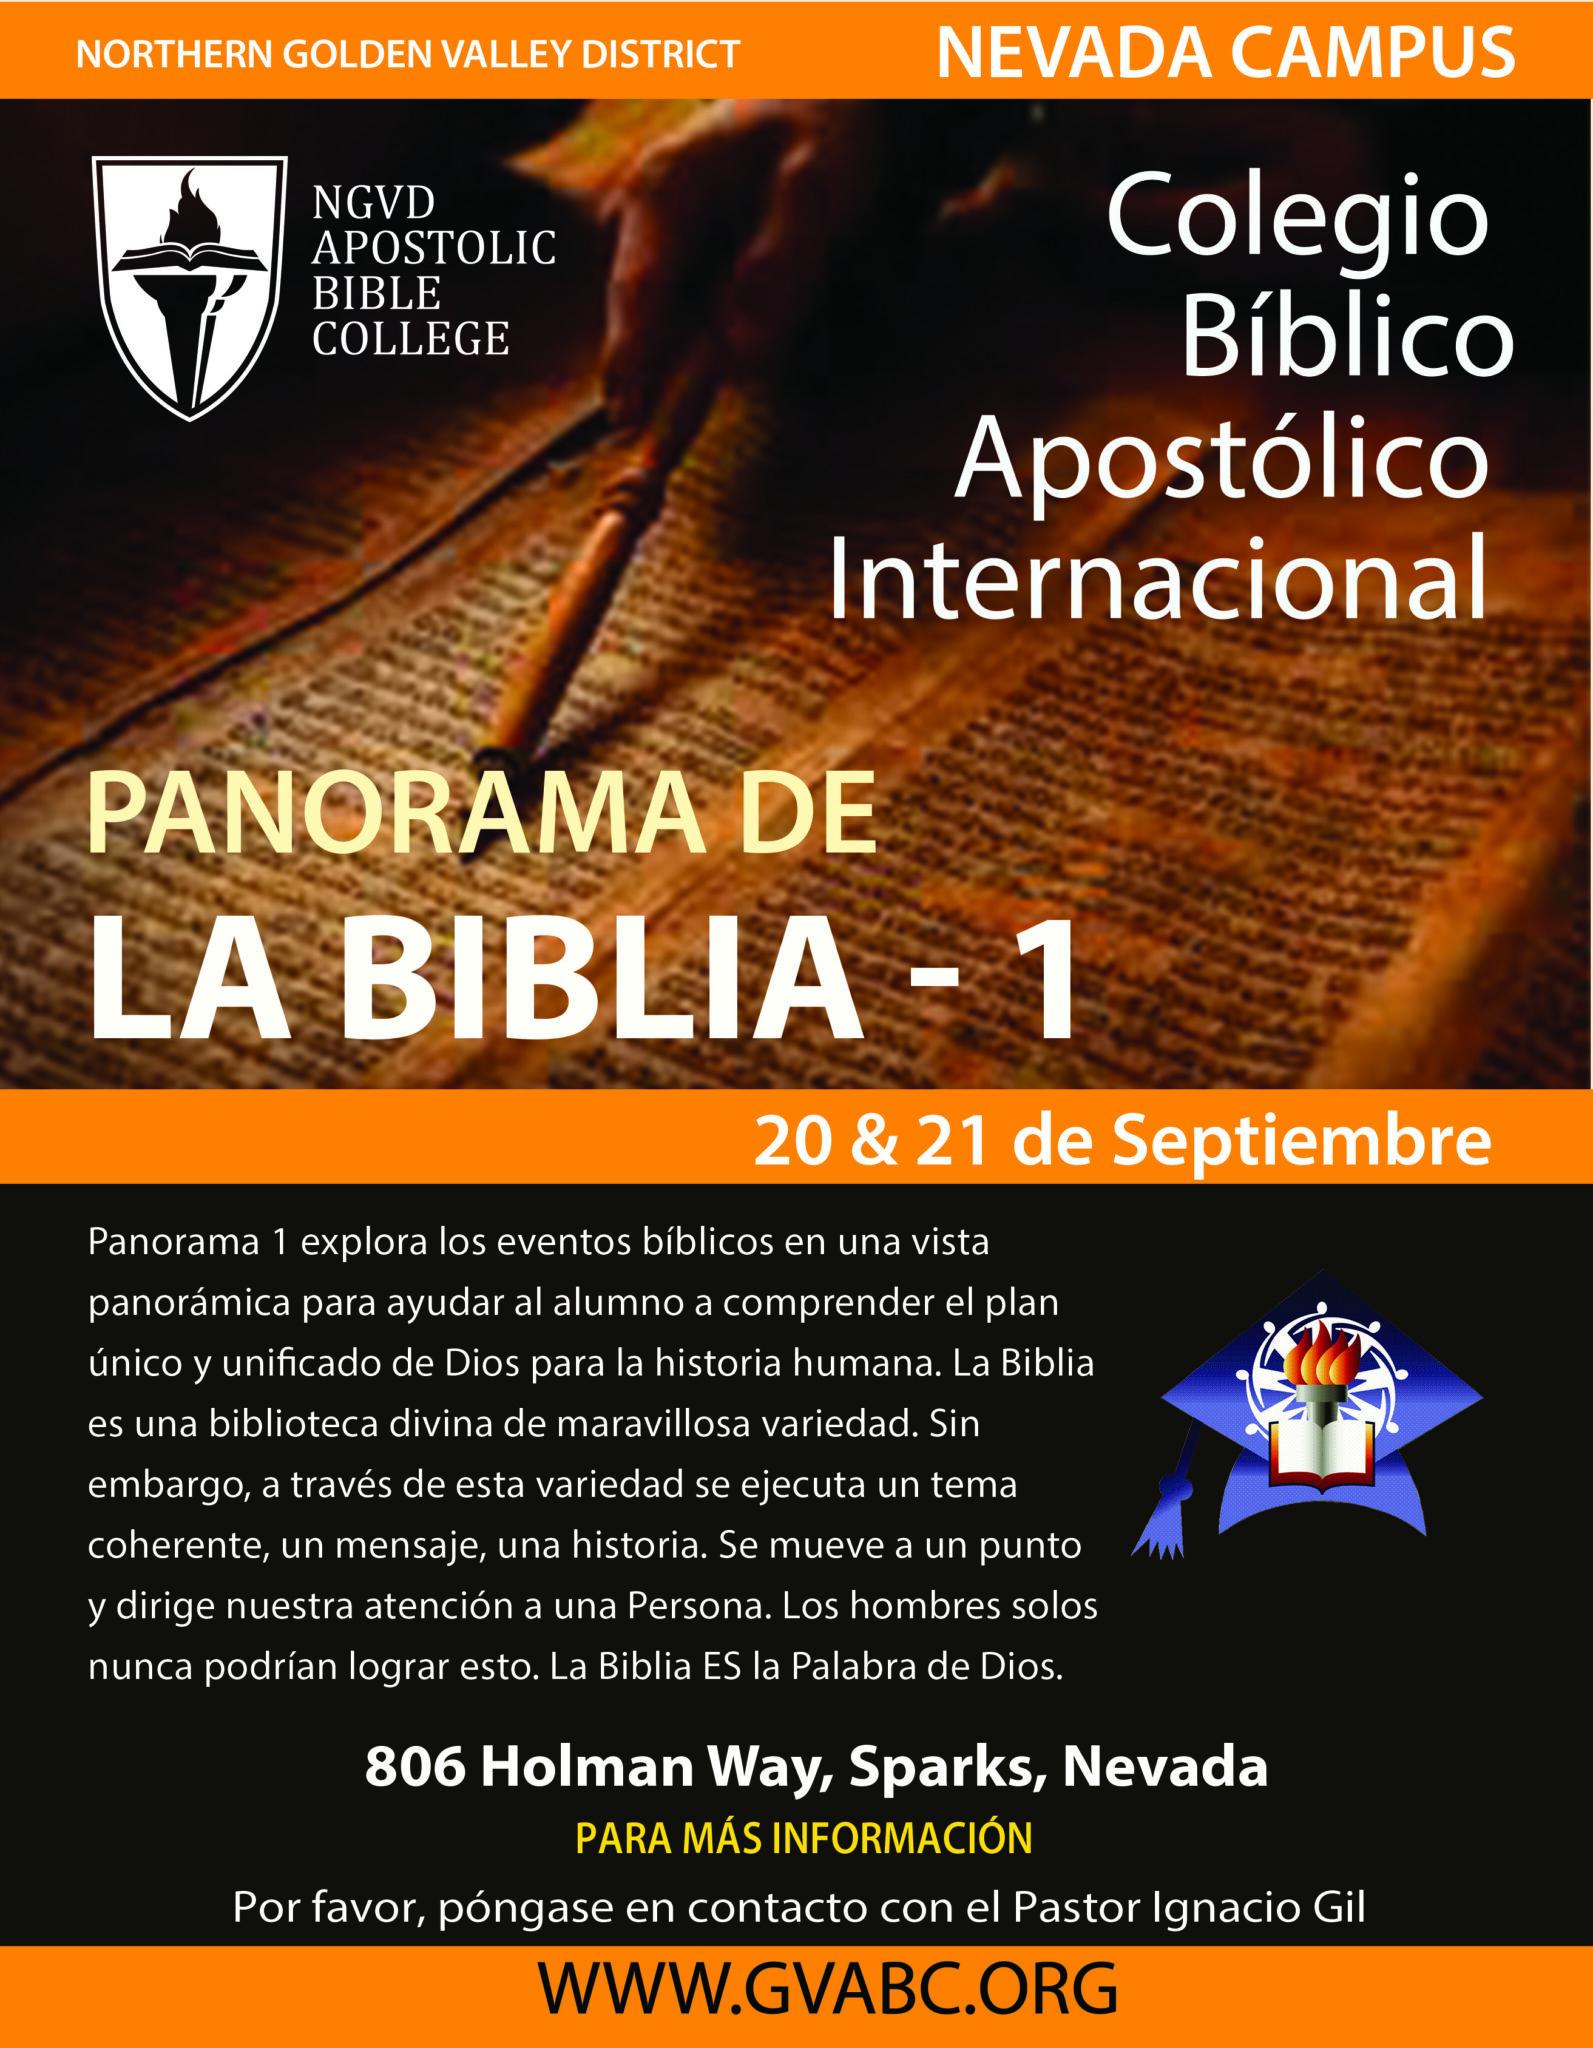 Northern Golden Valley District Apostolic Bible College